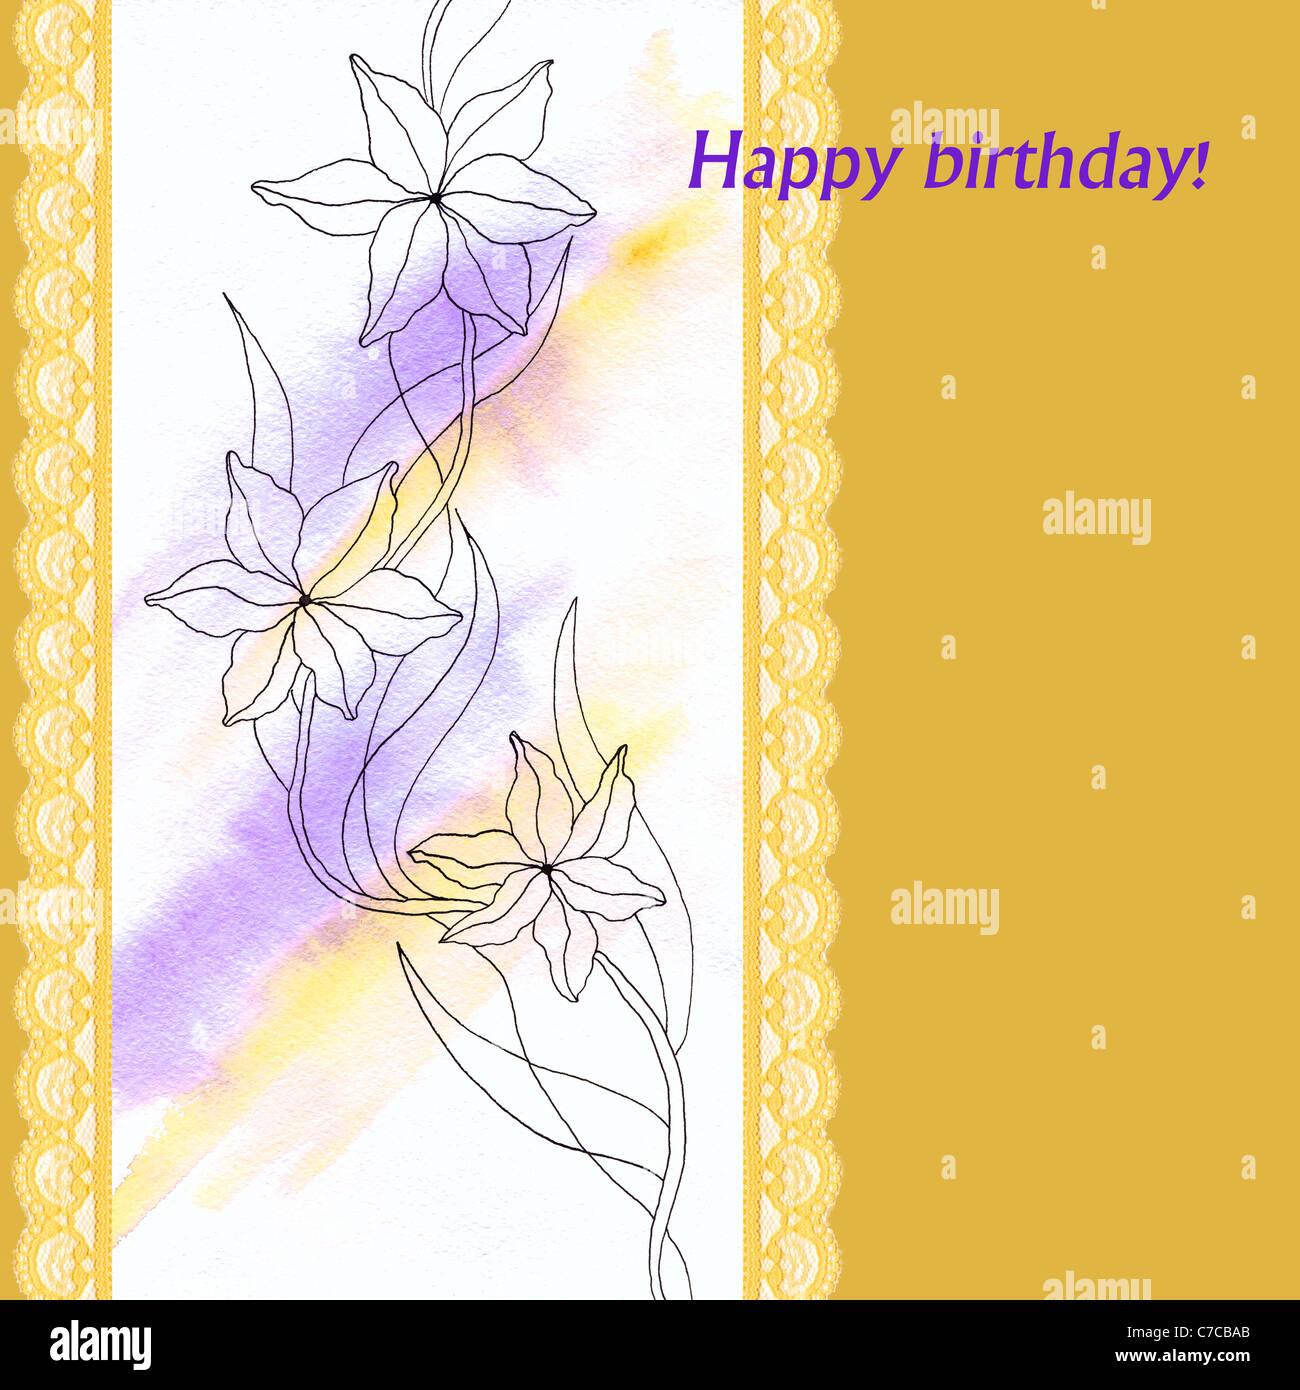 Birthday Card With Flowers Stock Photos Birthday Card With Flowers